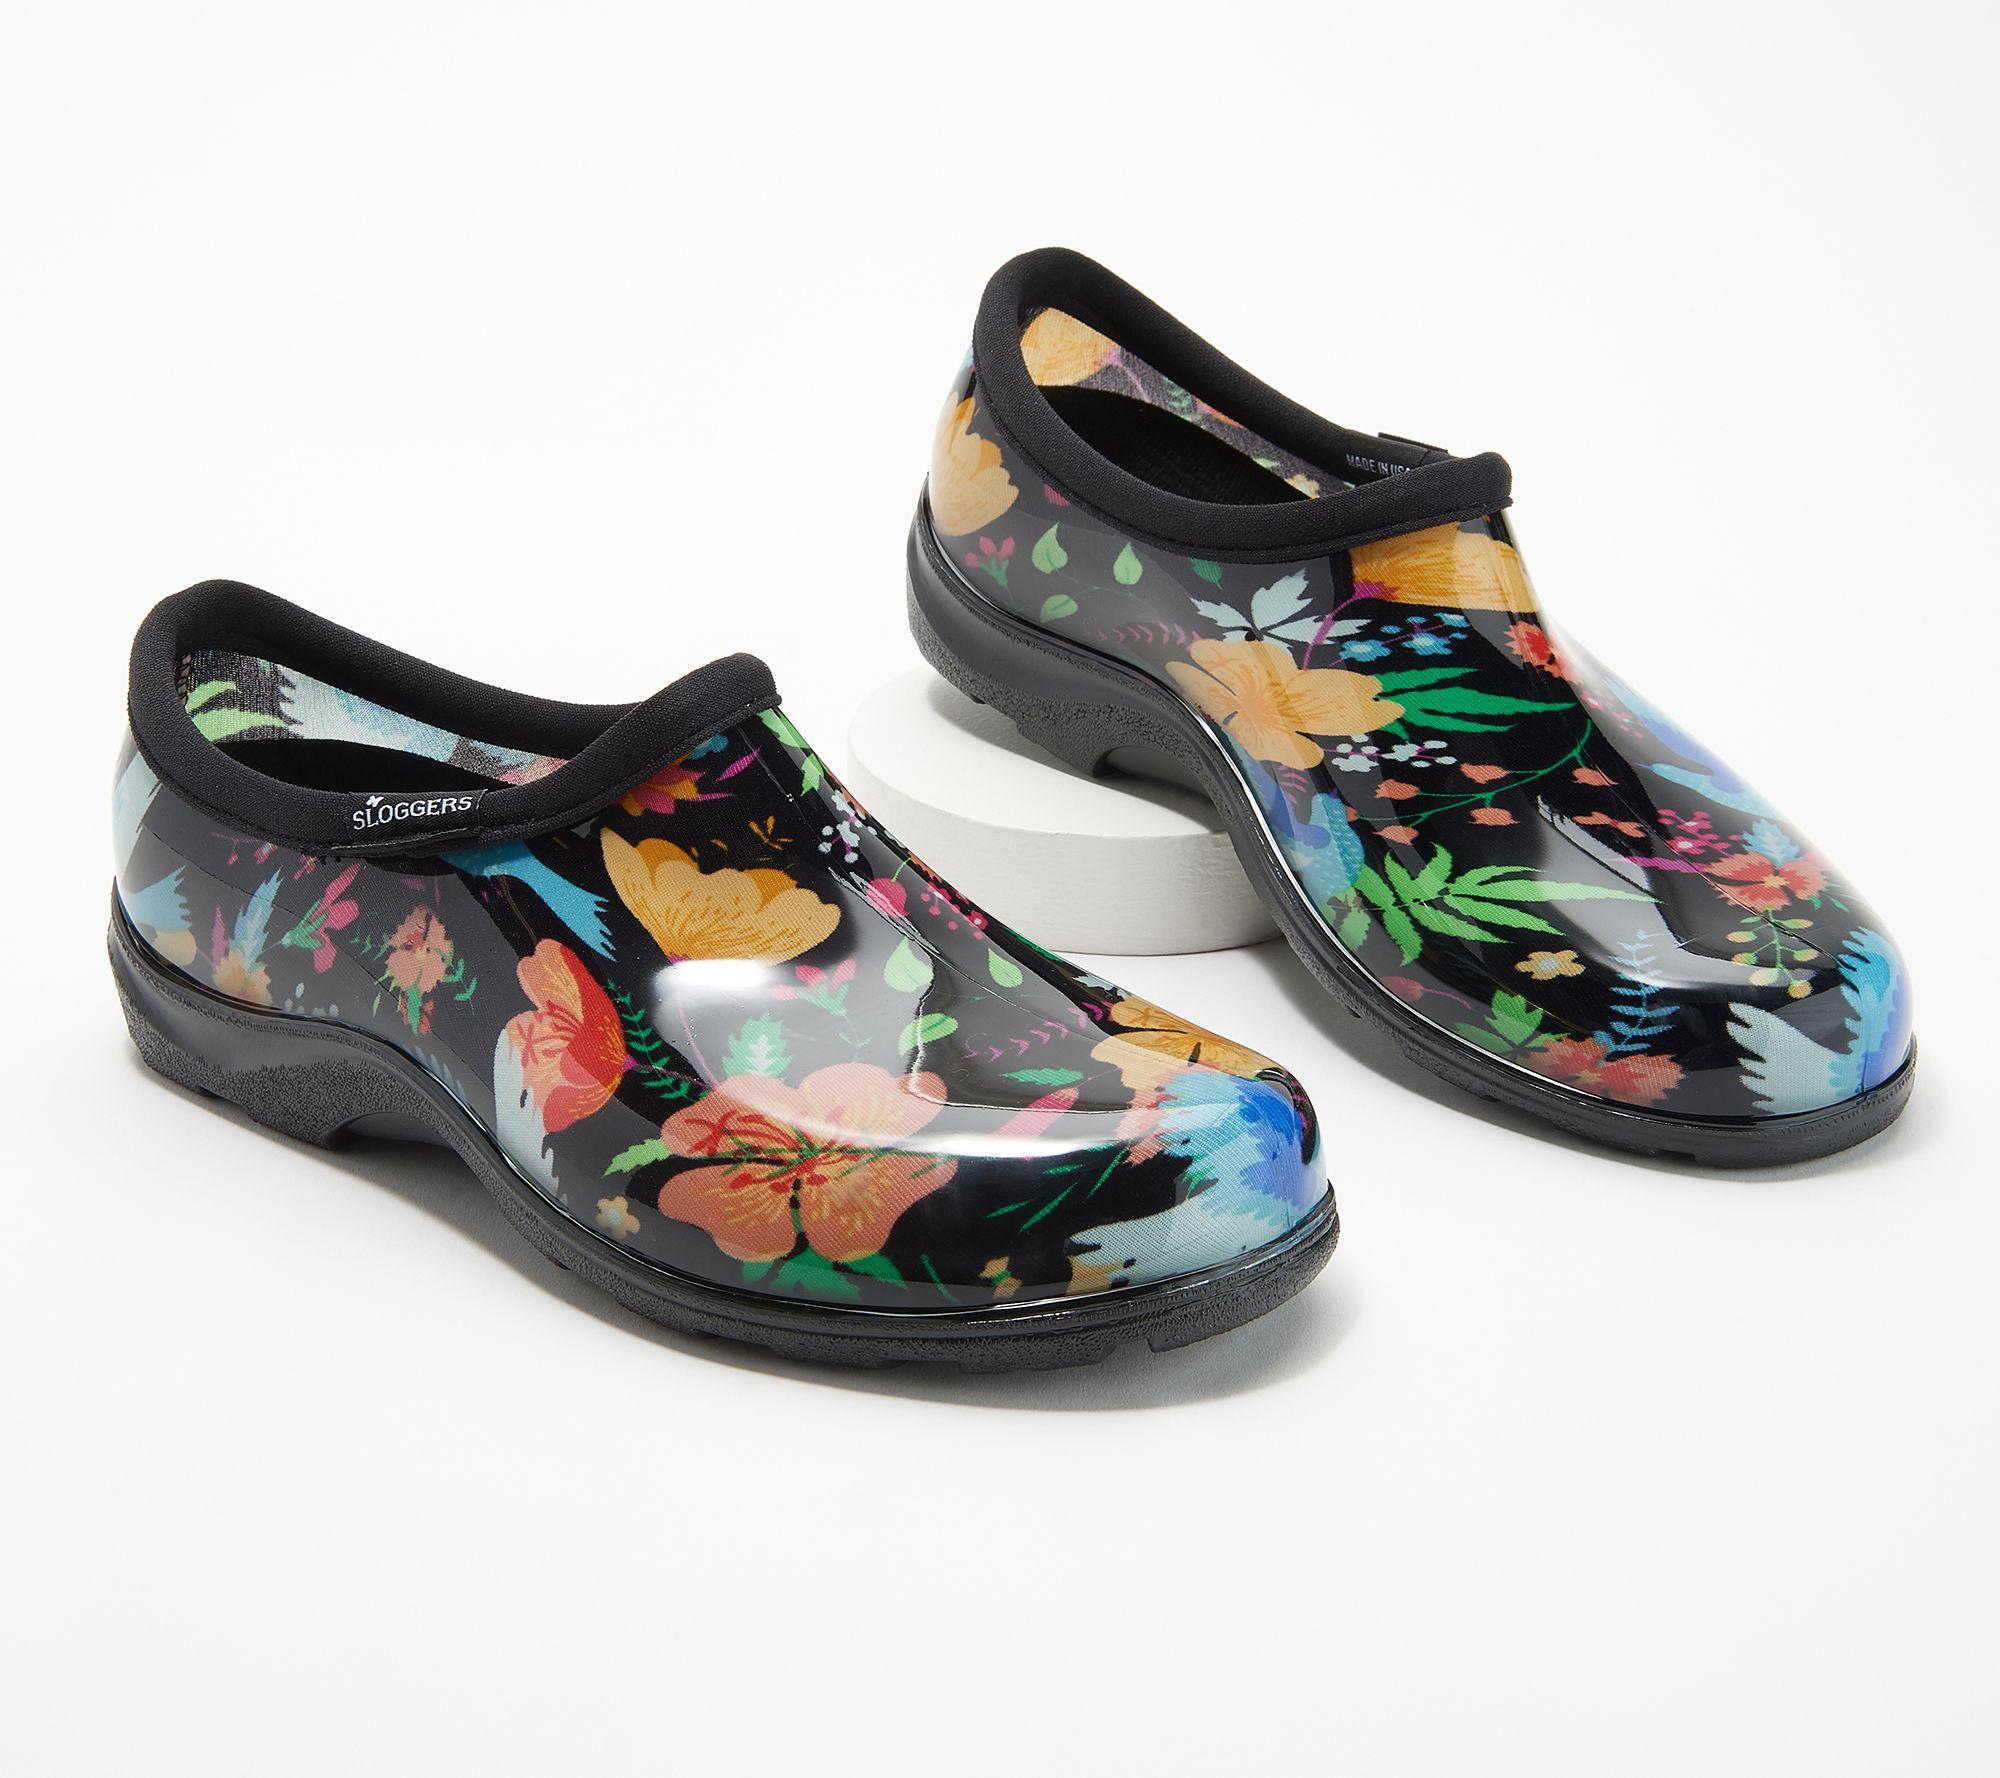 e1ad2f342d46 Sloggers Waterproof Peaceful Garden Comfort Garden Shoe - Page 1 — QVC.com